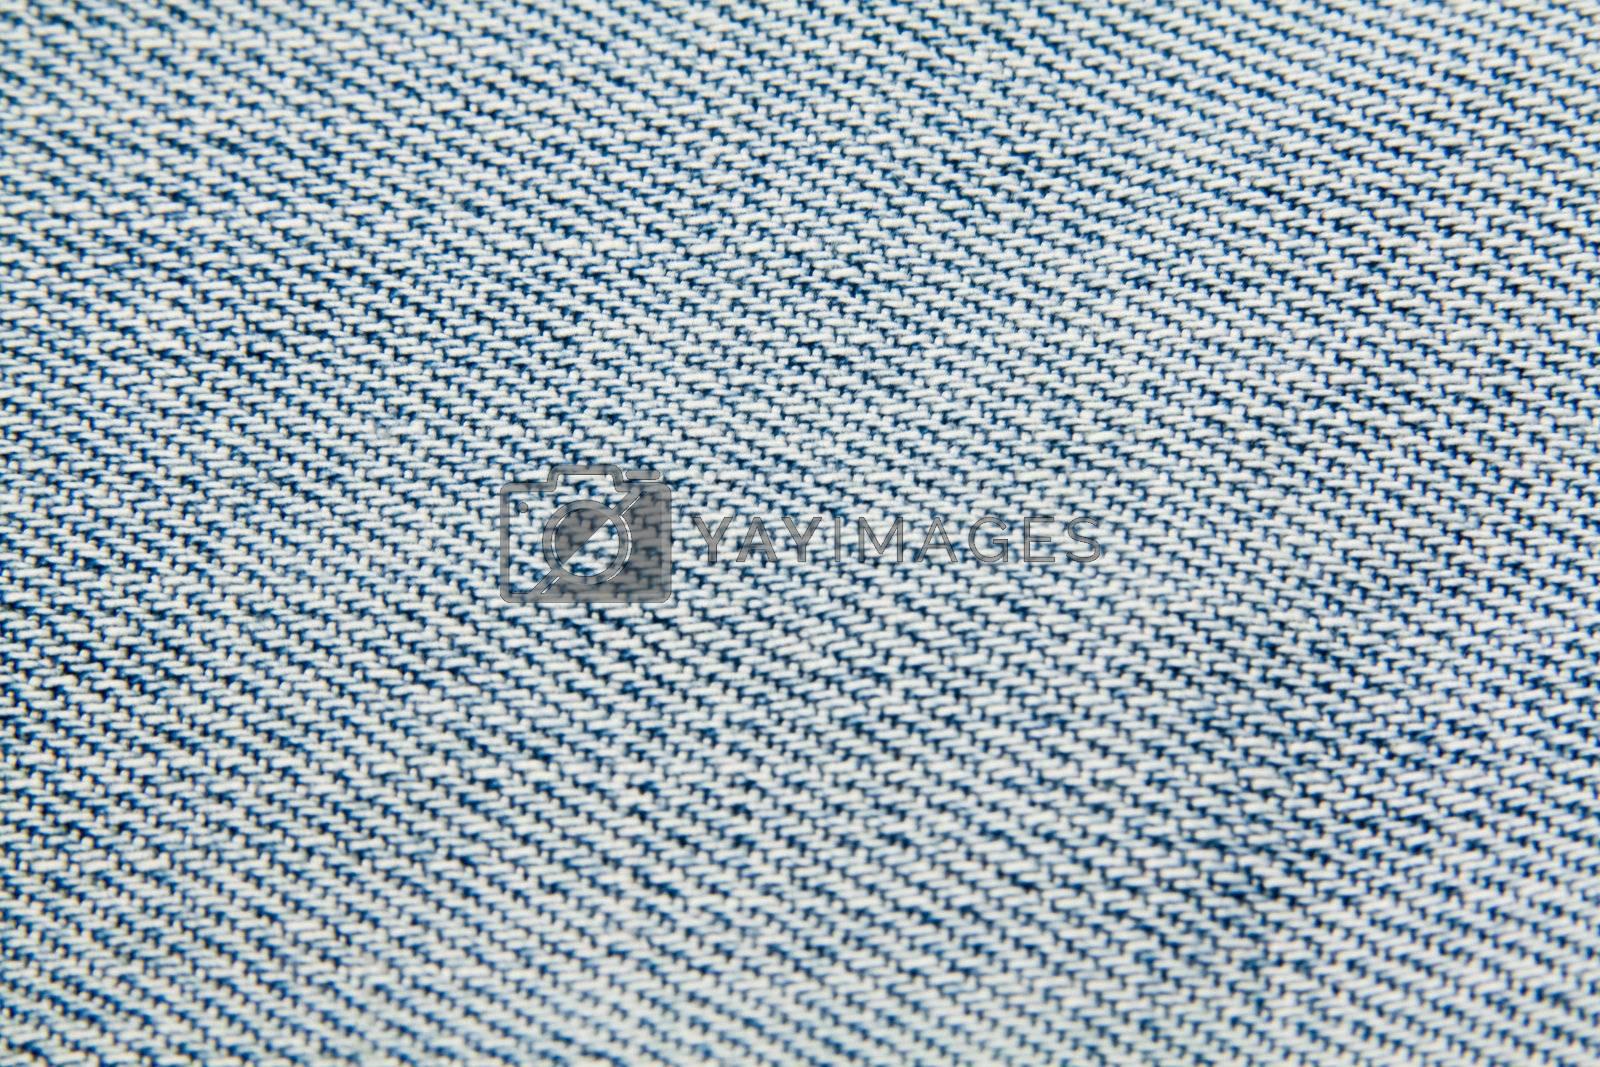 close-up of blue jean material, denim